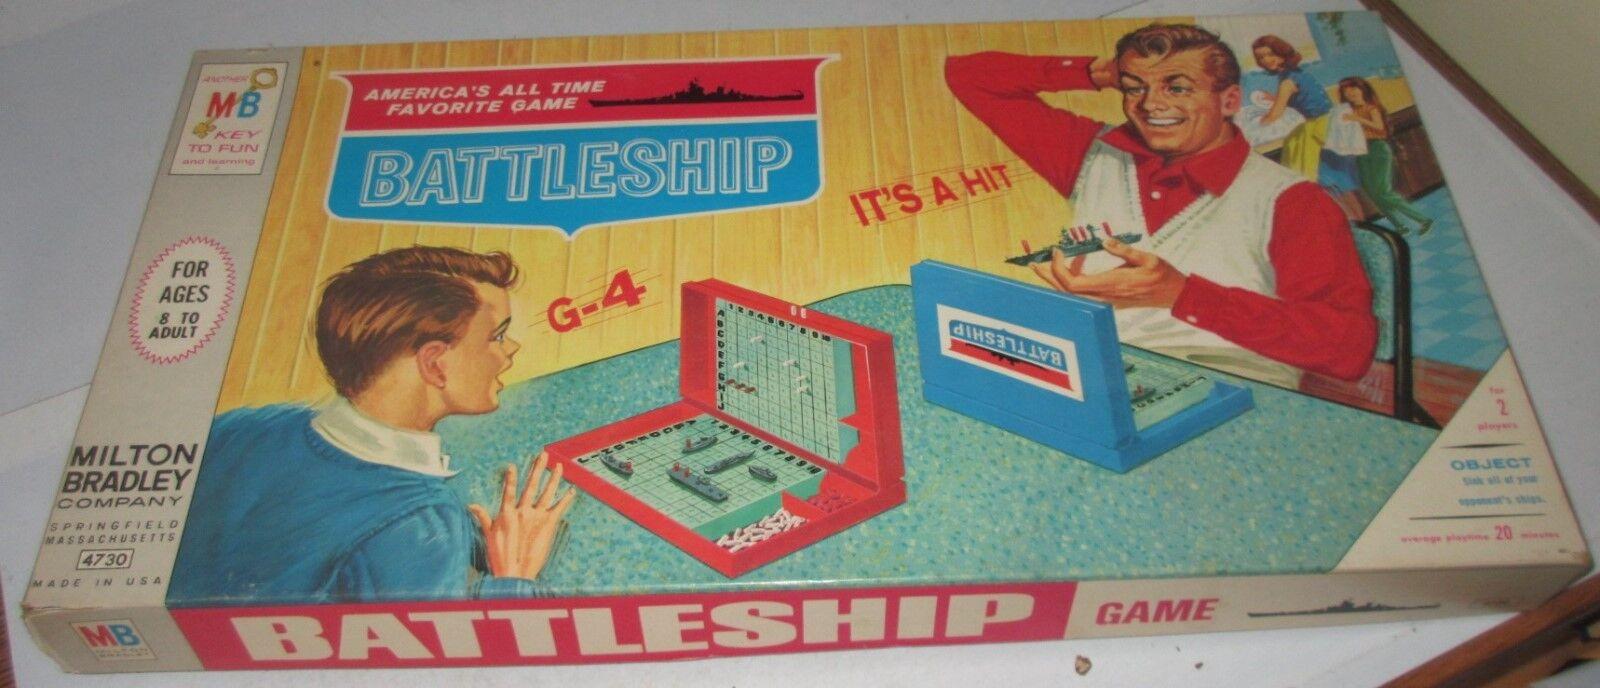 VINTAGE ORIGINAL 1967 Cuirassé Board Game Used sexiste COVER RARE Family Fun